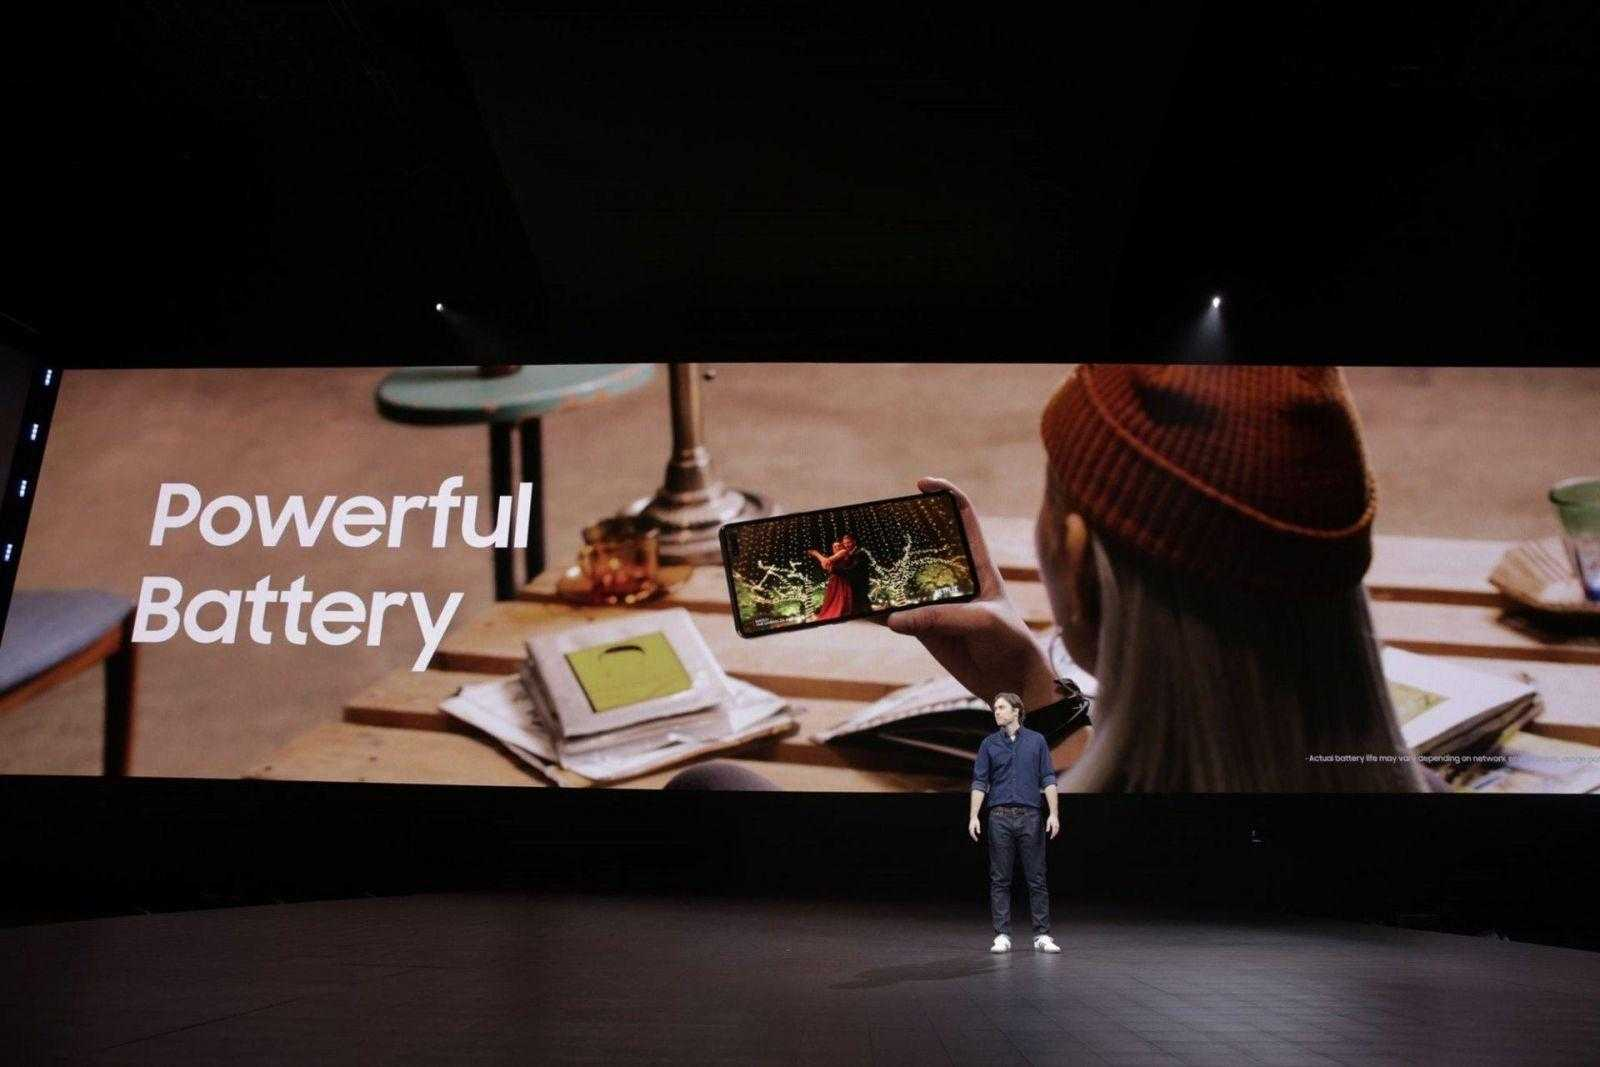 Samsung показал самый мощный смартфон Galaxy S10 5G (lcimg 7c3e1bf6 8ded 422e b653 29e76e1b3826)